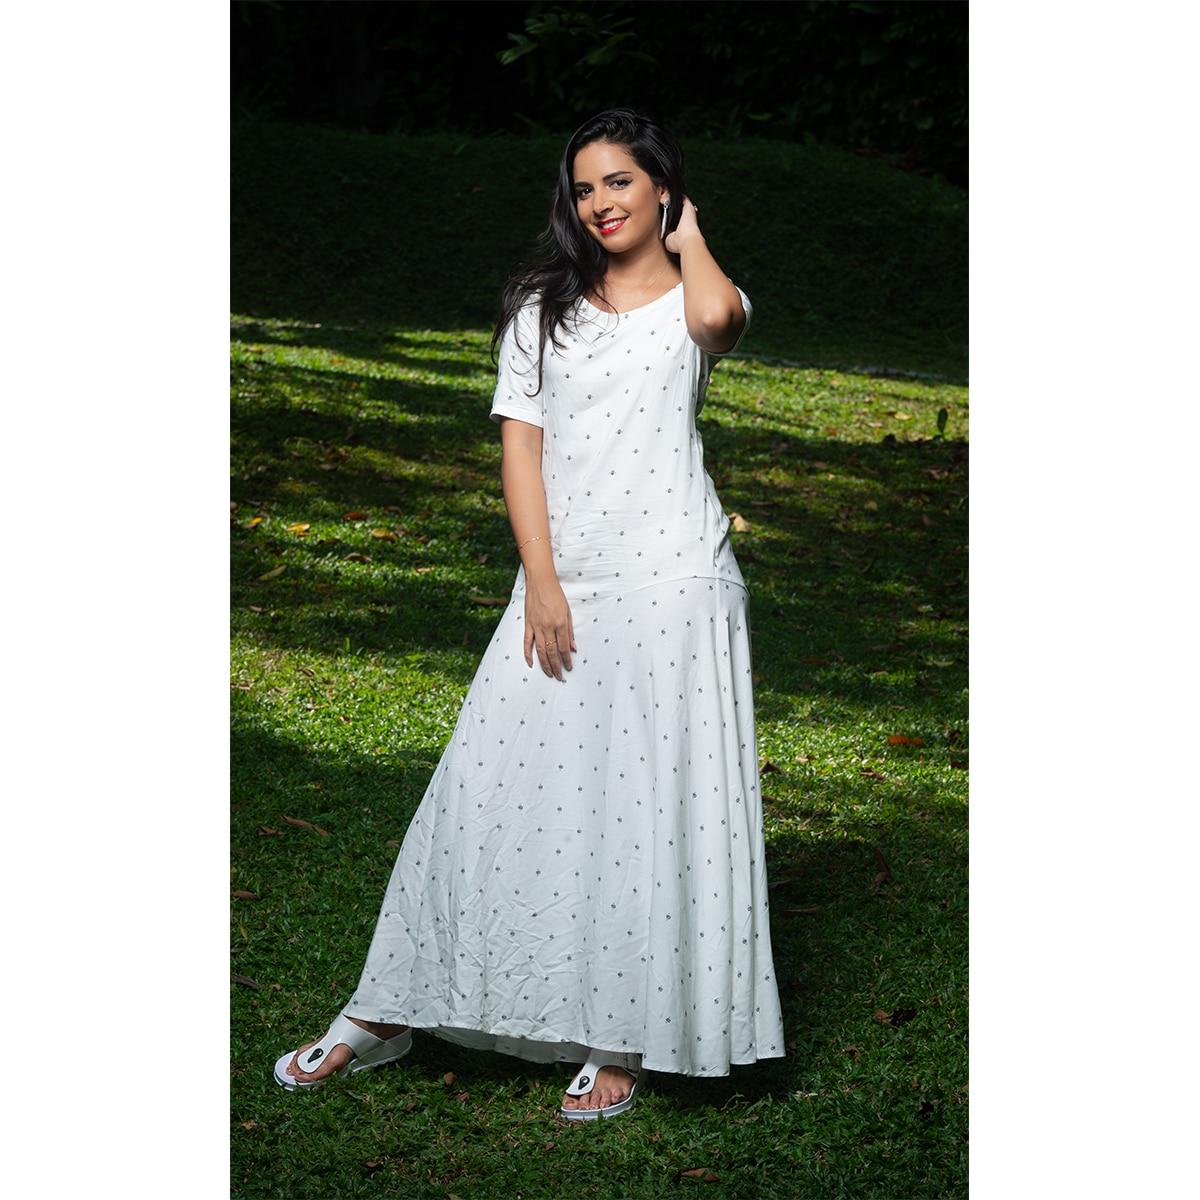 Normal Frock Designs 2017 Sri Lanka: Flare Mid-sleeve Print Maxi Dress